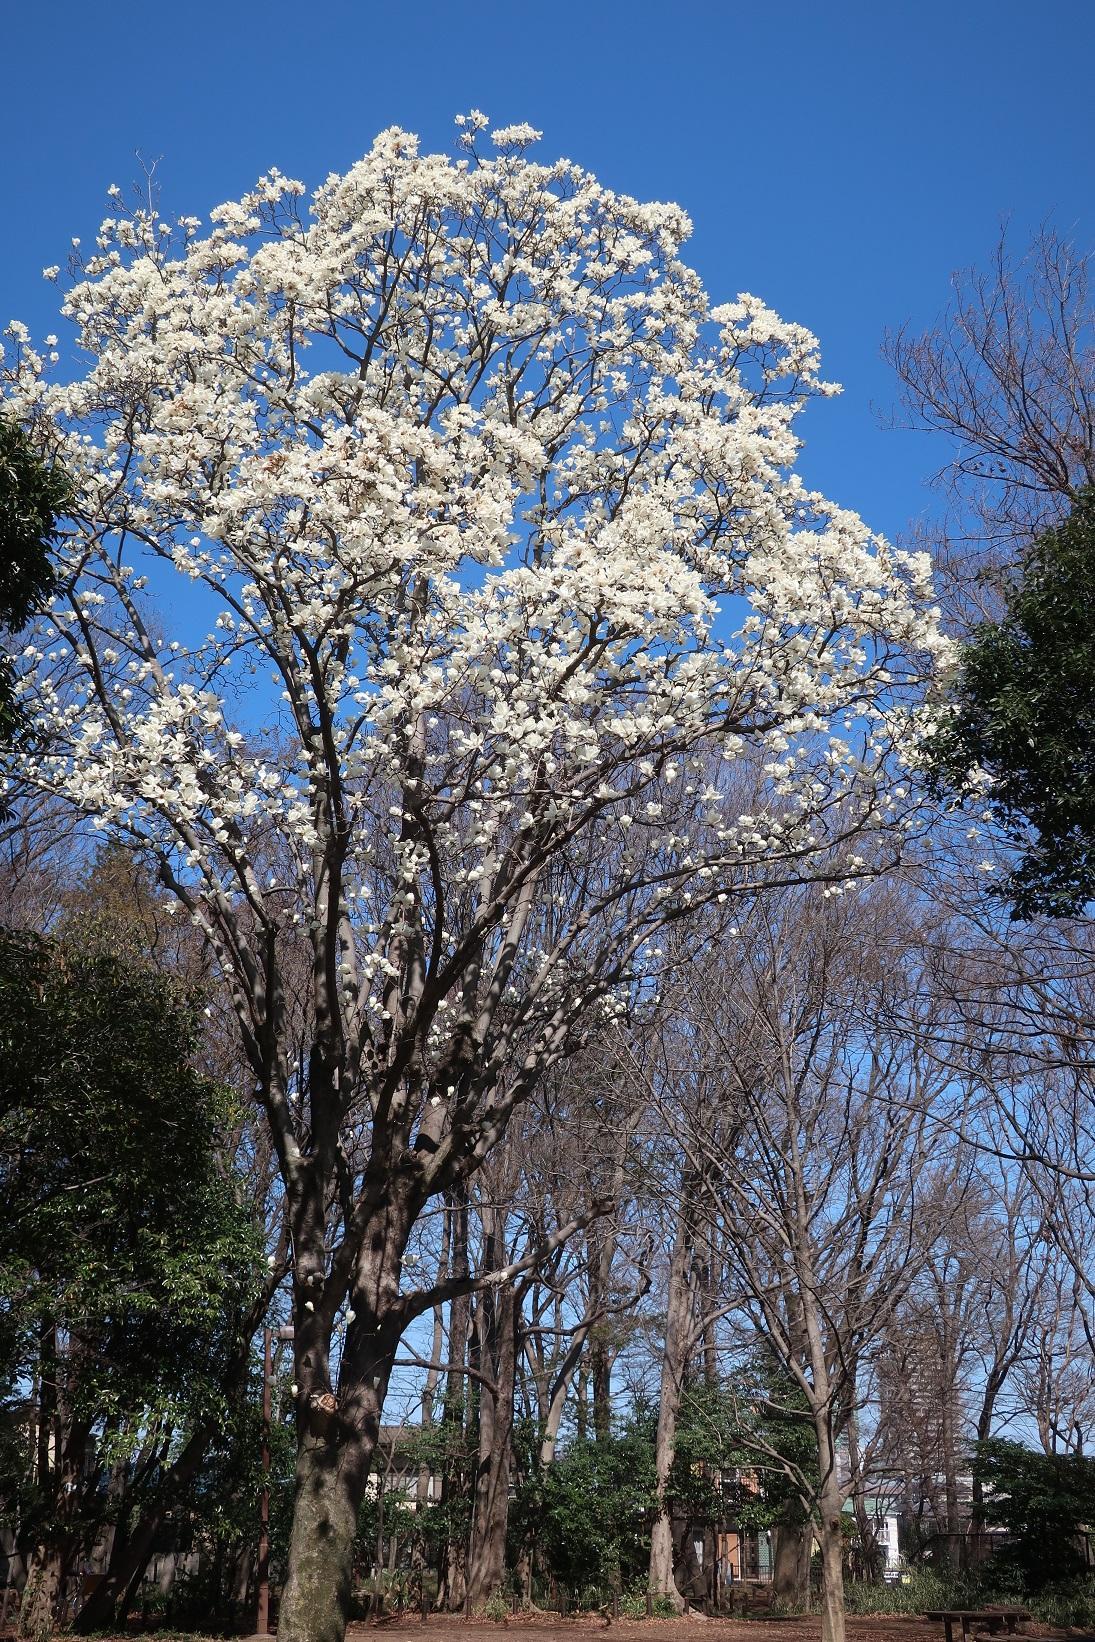 Midori Mori place yulan of Igashira